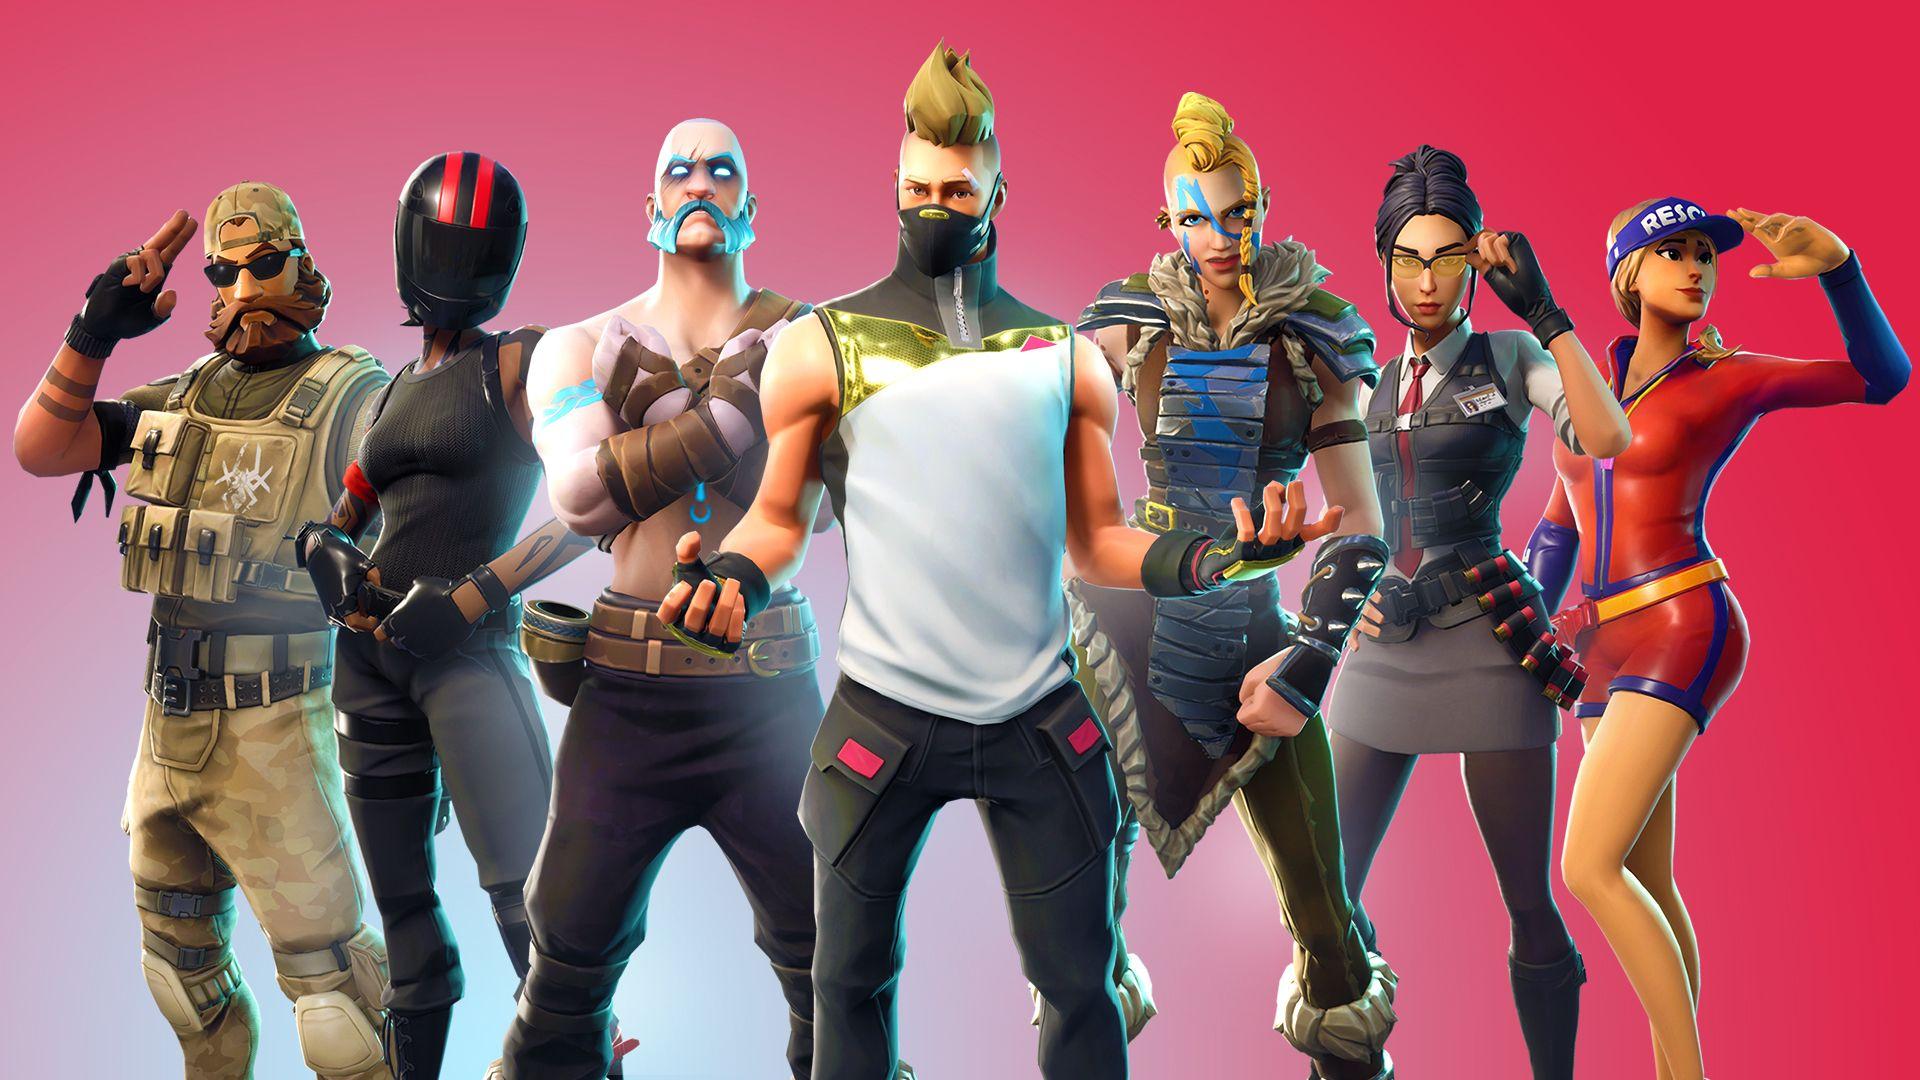 Fortnite Season 5 Fortnite Battle Royale Game Epic Games